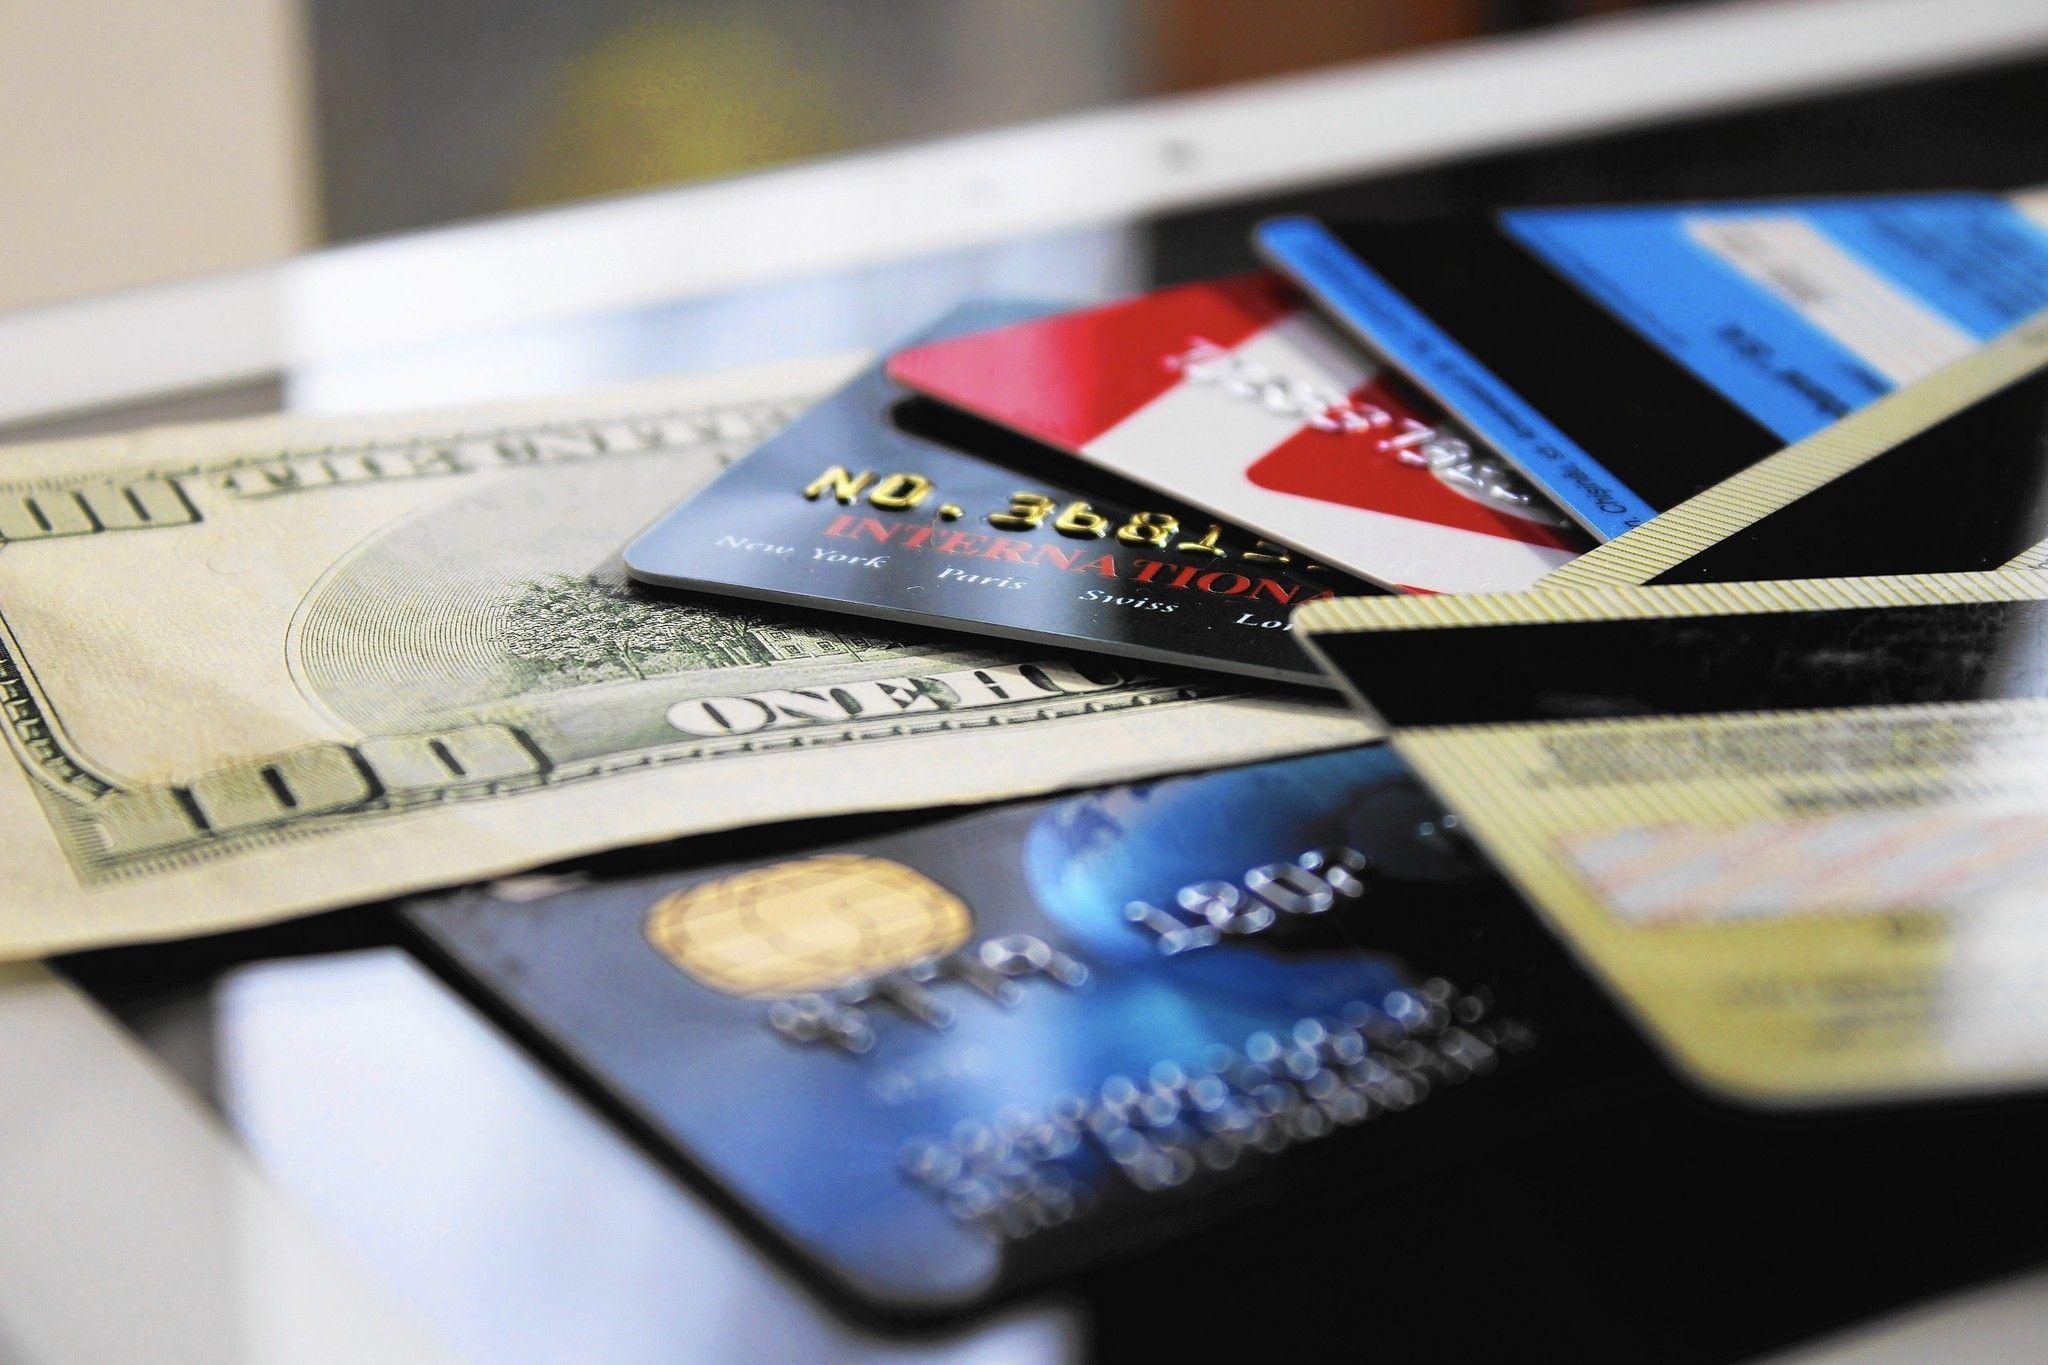 Personal Finance Q A Installment Loan Debt Vs Credit Card Debt La Times Credit Card Prepaid Credit Card Finance